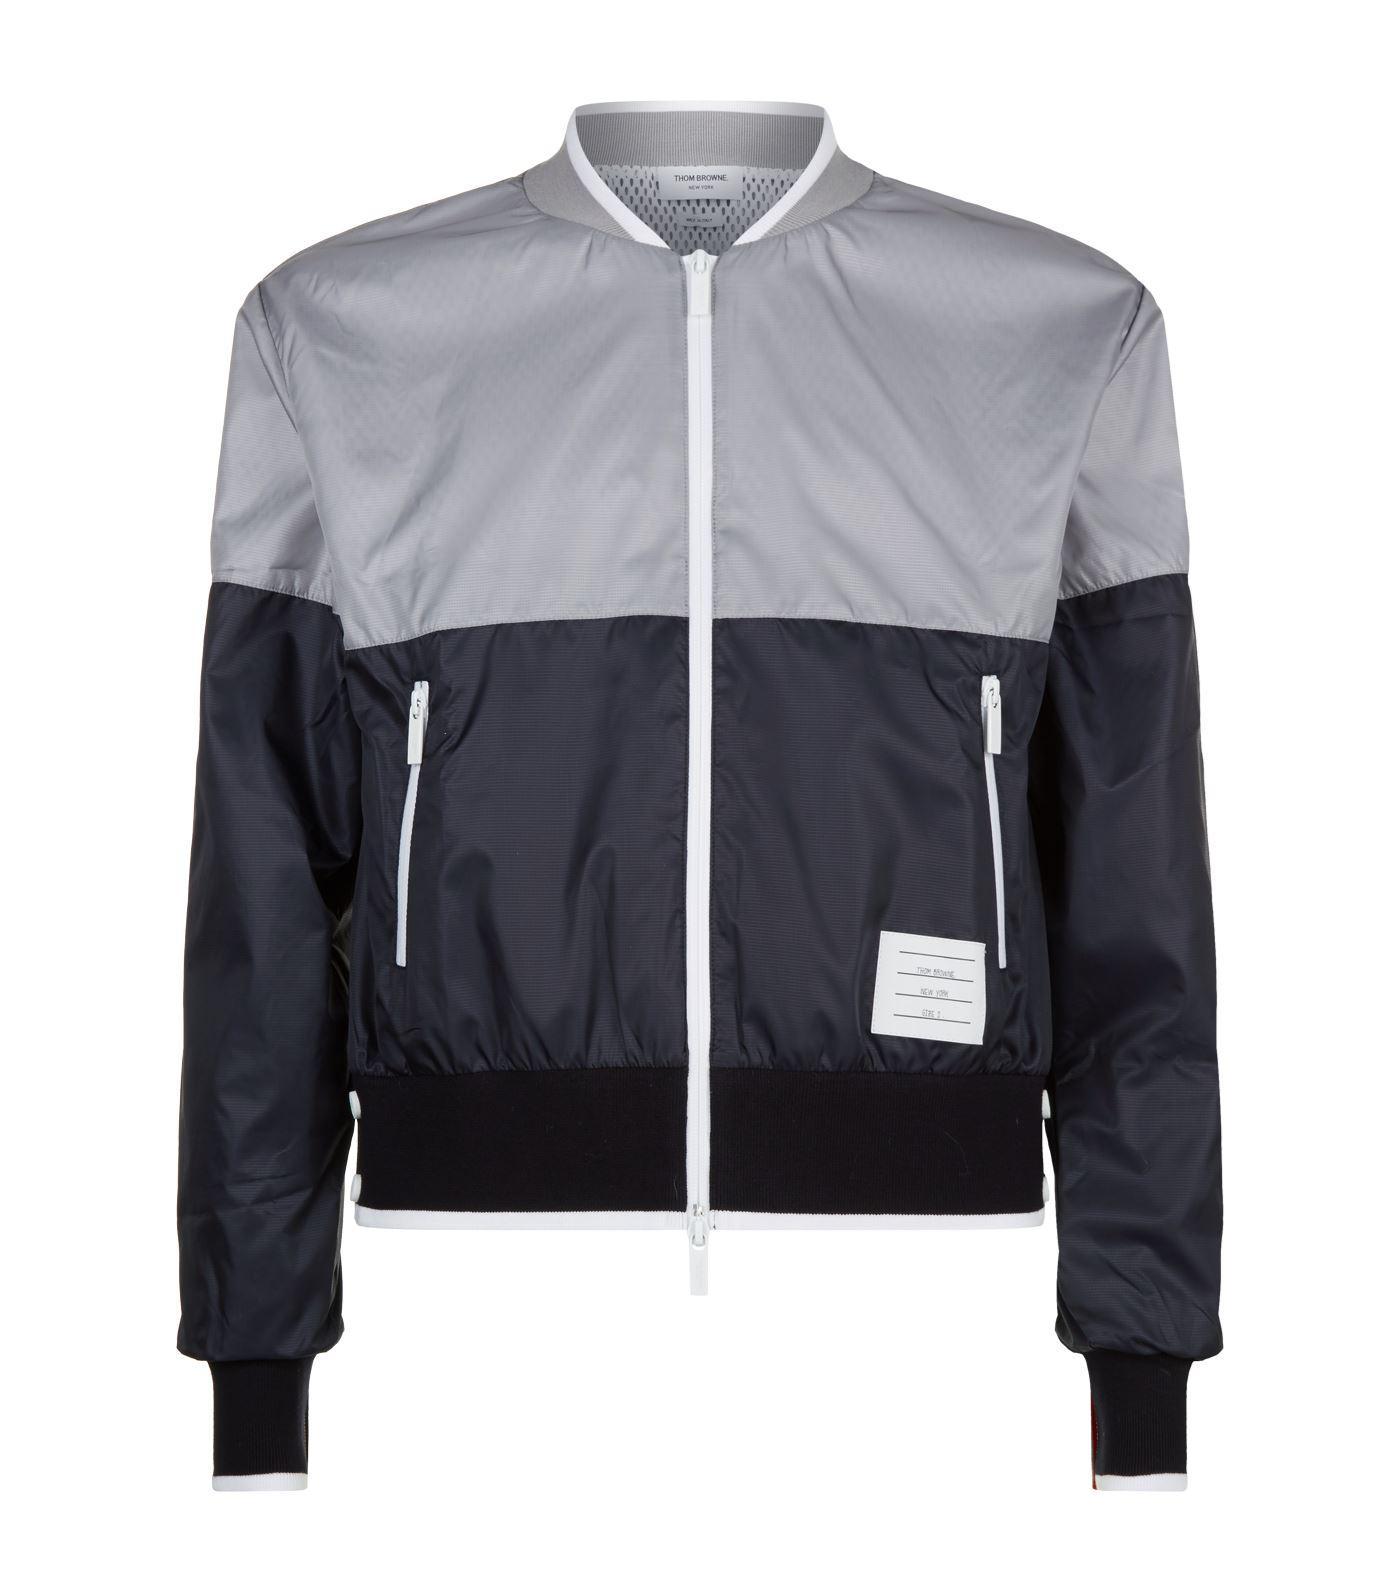 dfe5b781581 Thom Browne - Multicolor Colour Block Bomber Jacket for Men - Lyst. View  fullscreen